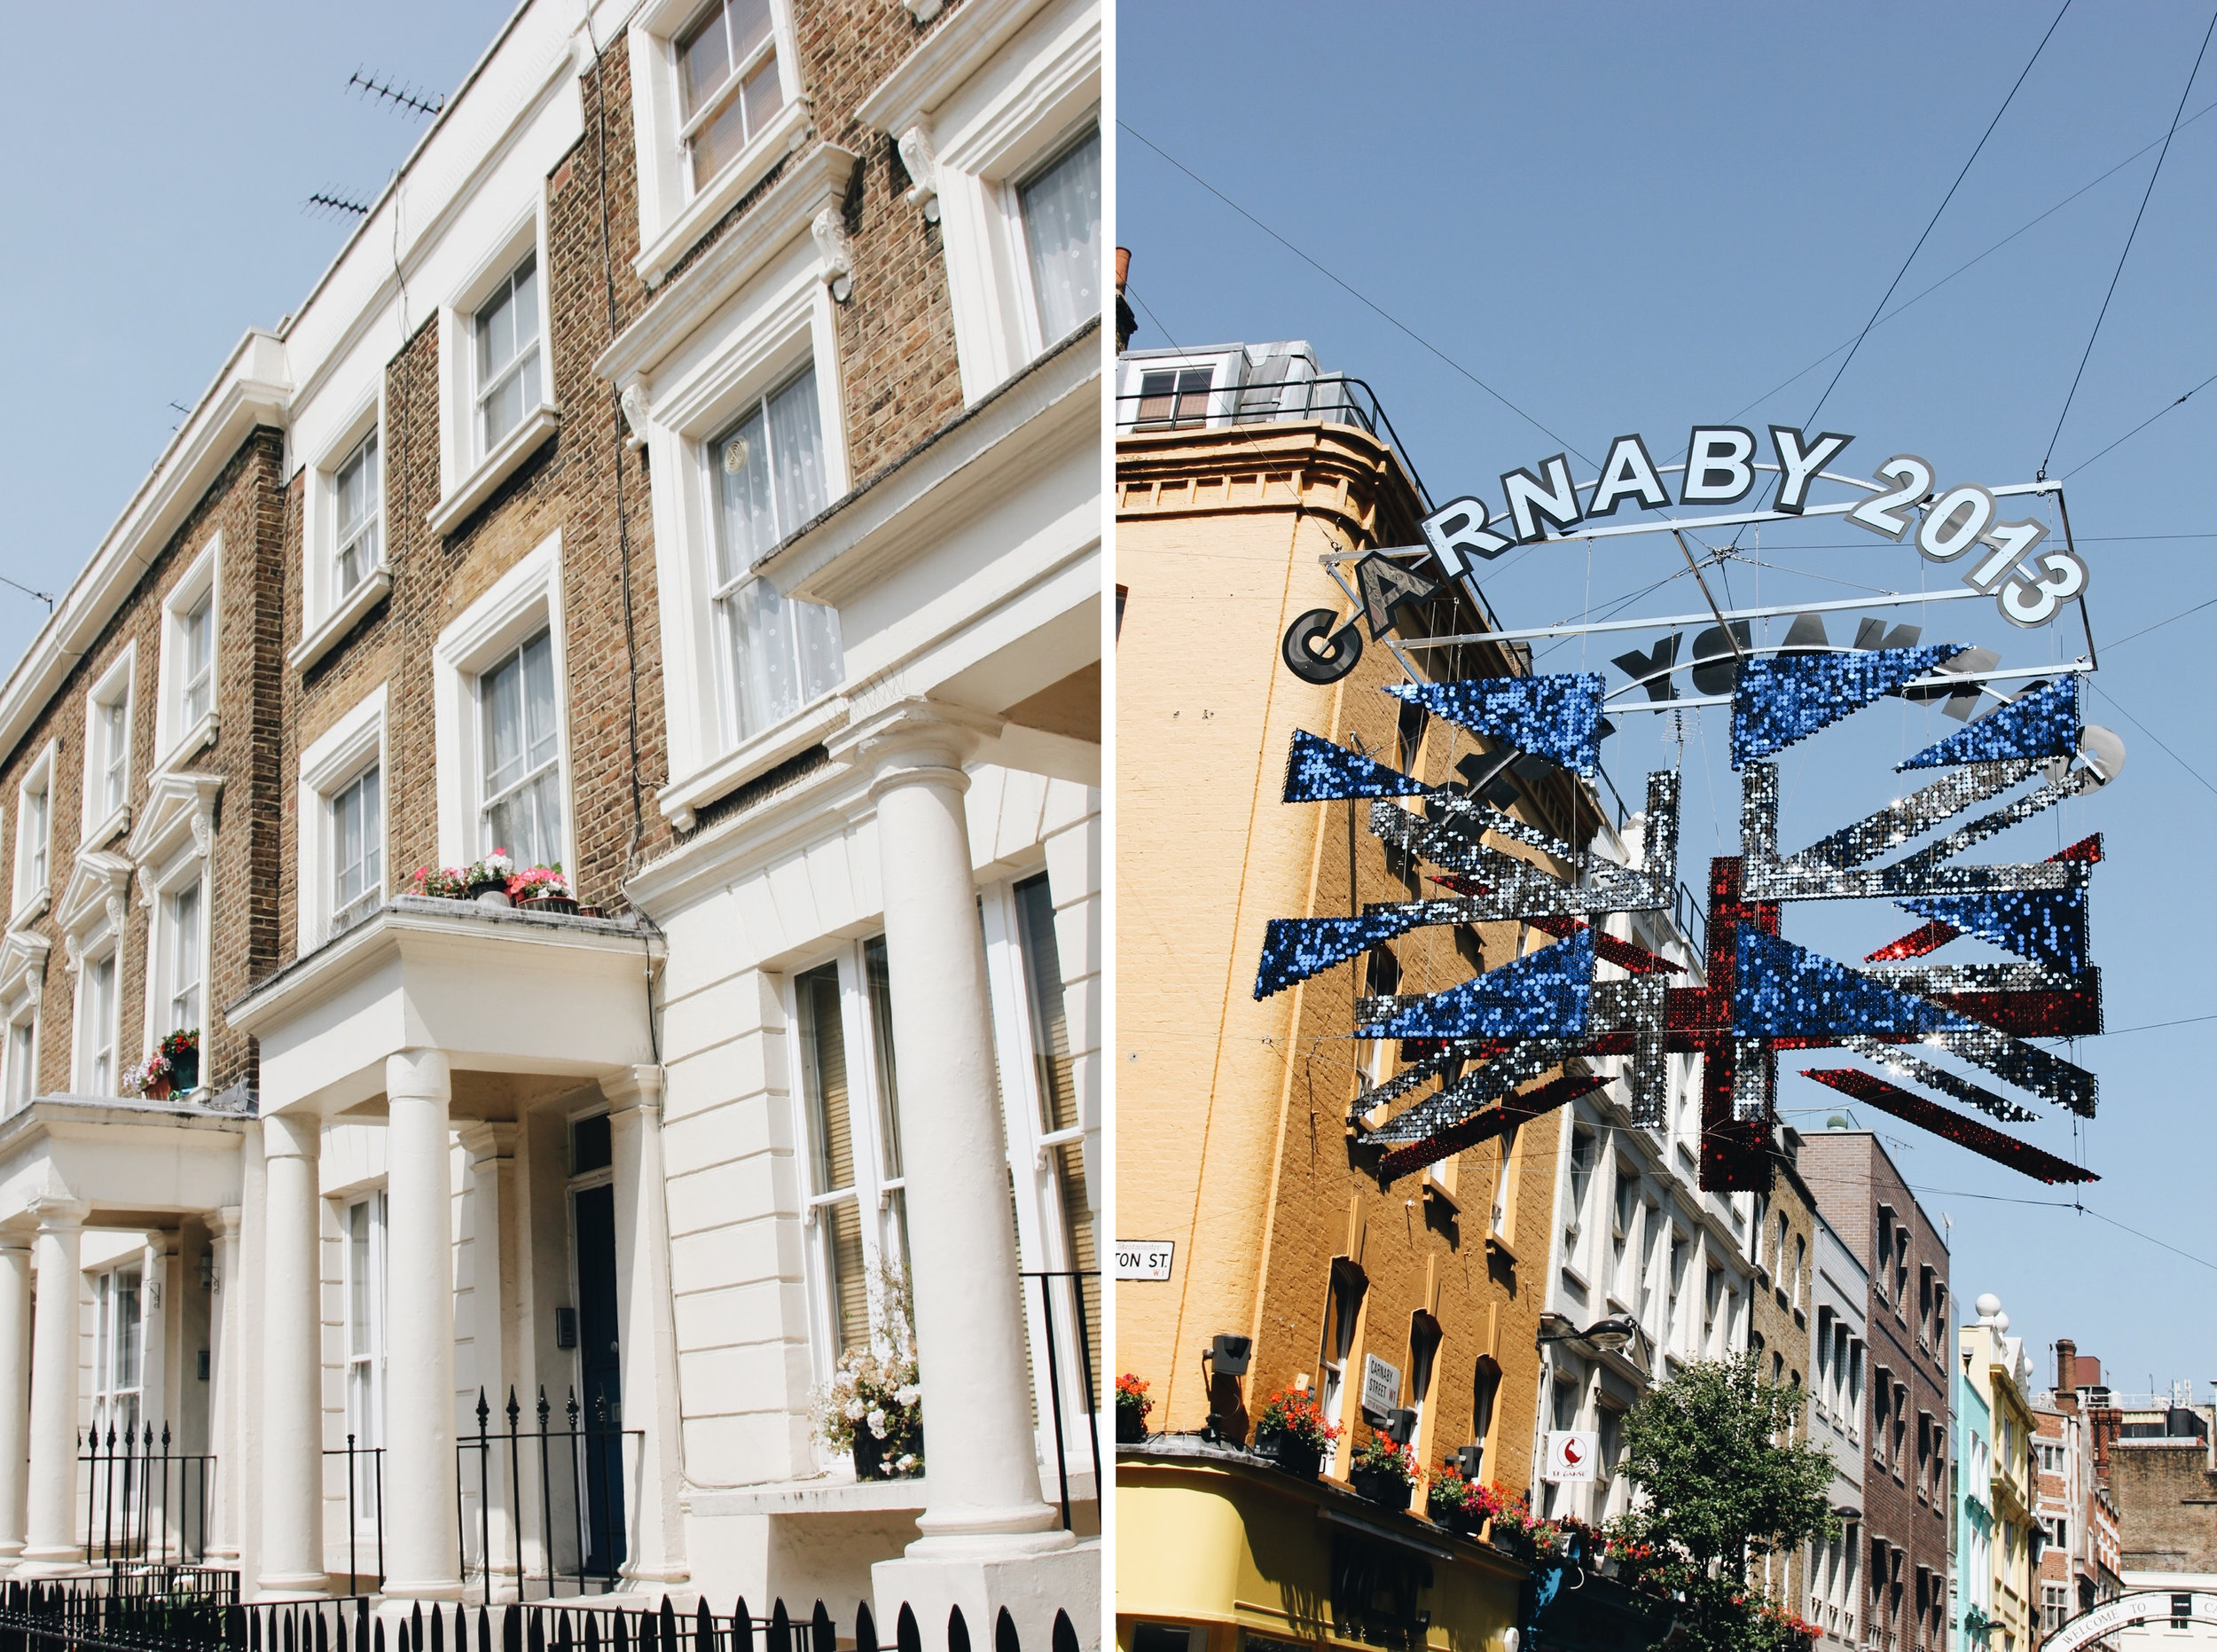 carnabystreet-londres-onmywayblog.JPG